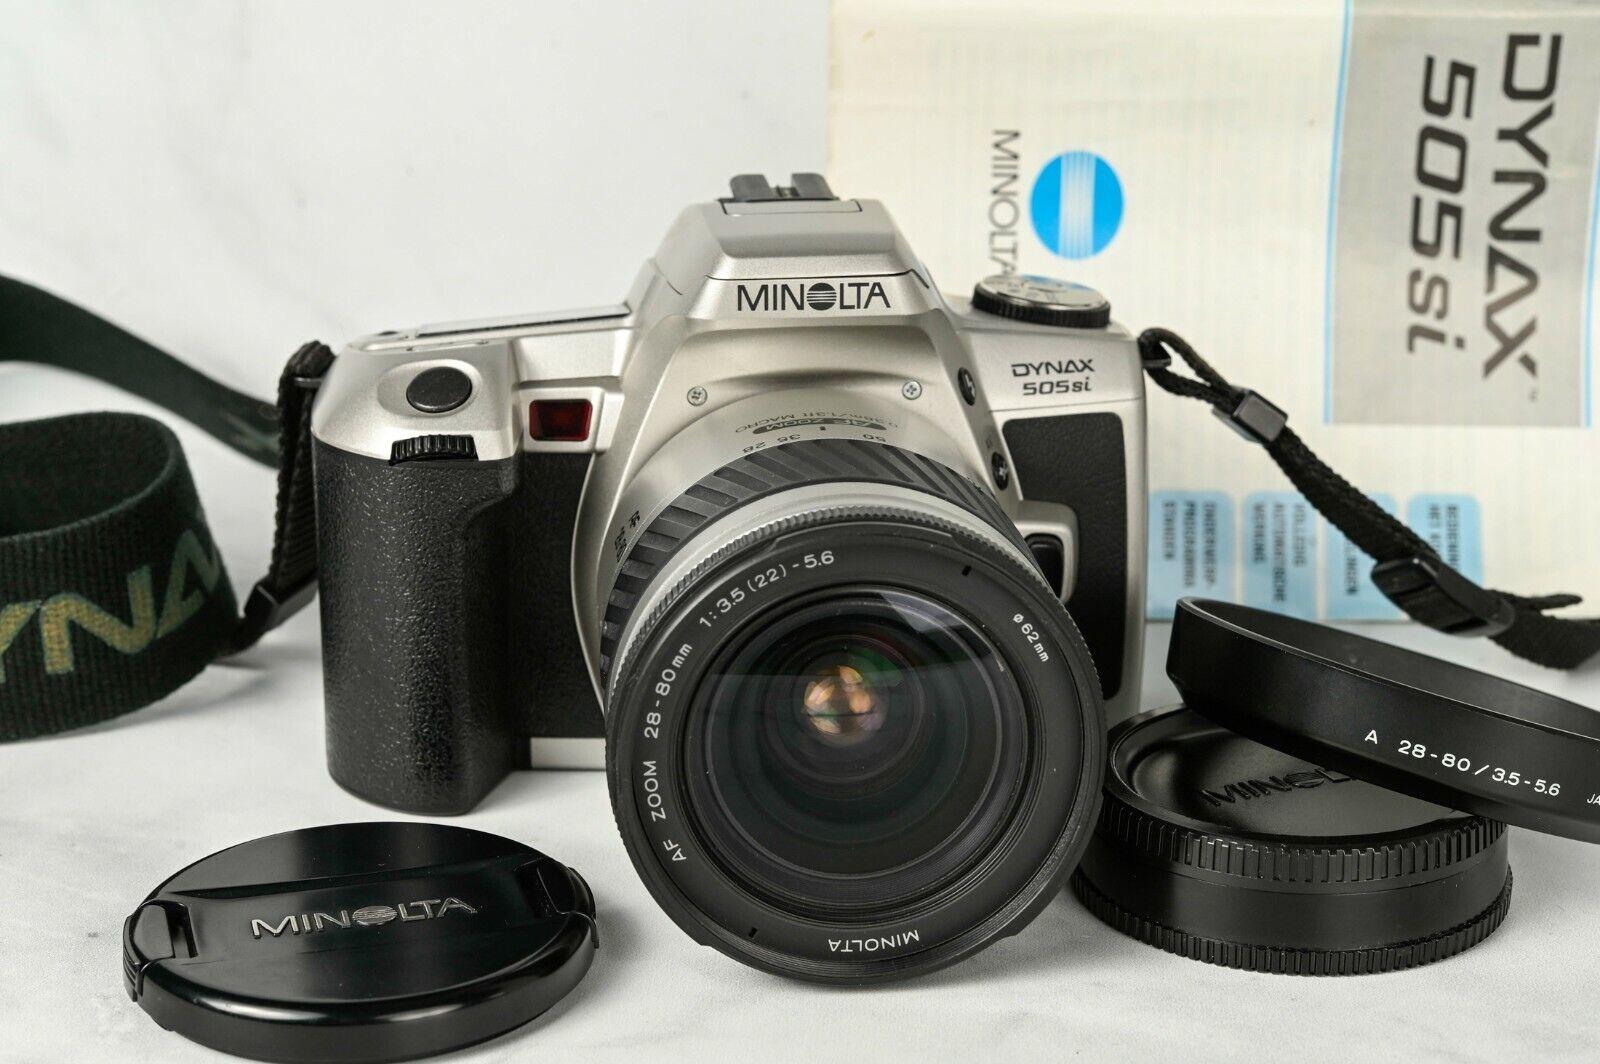 Minolta Dynax 505si SLR camera with Minolta AF Zoom 28-80mm lens // Maxxum Htsi